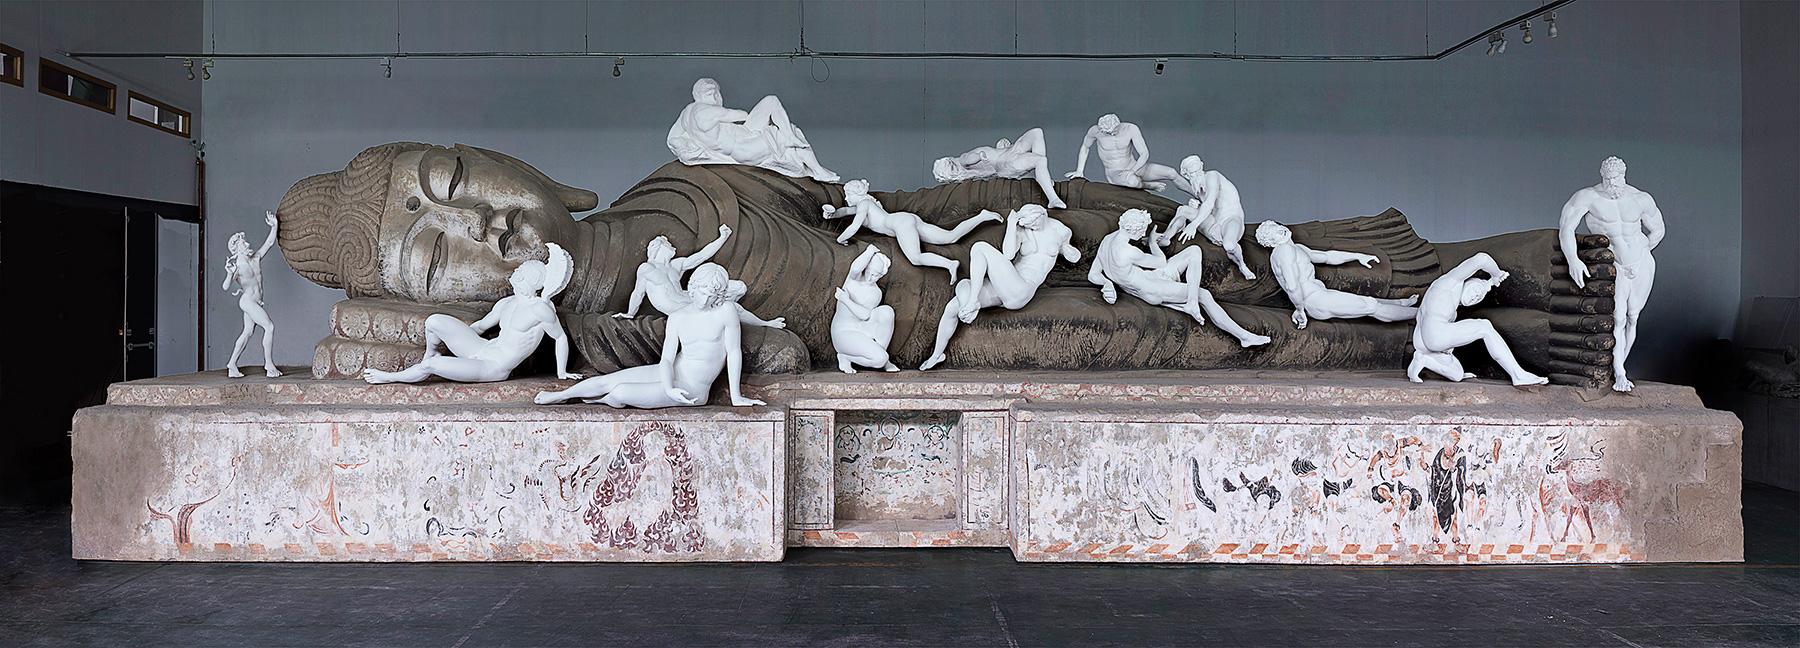 xu-zhen-eternity-buddha-national-gallery-victoria-designboom-1800.jpg